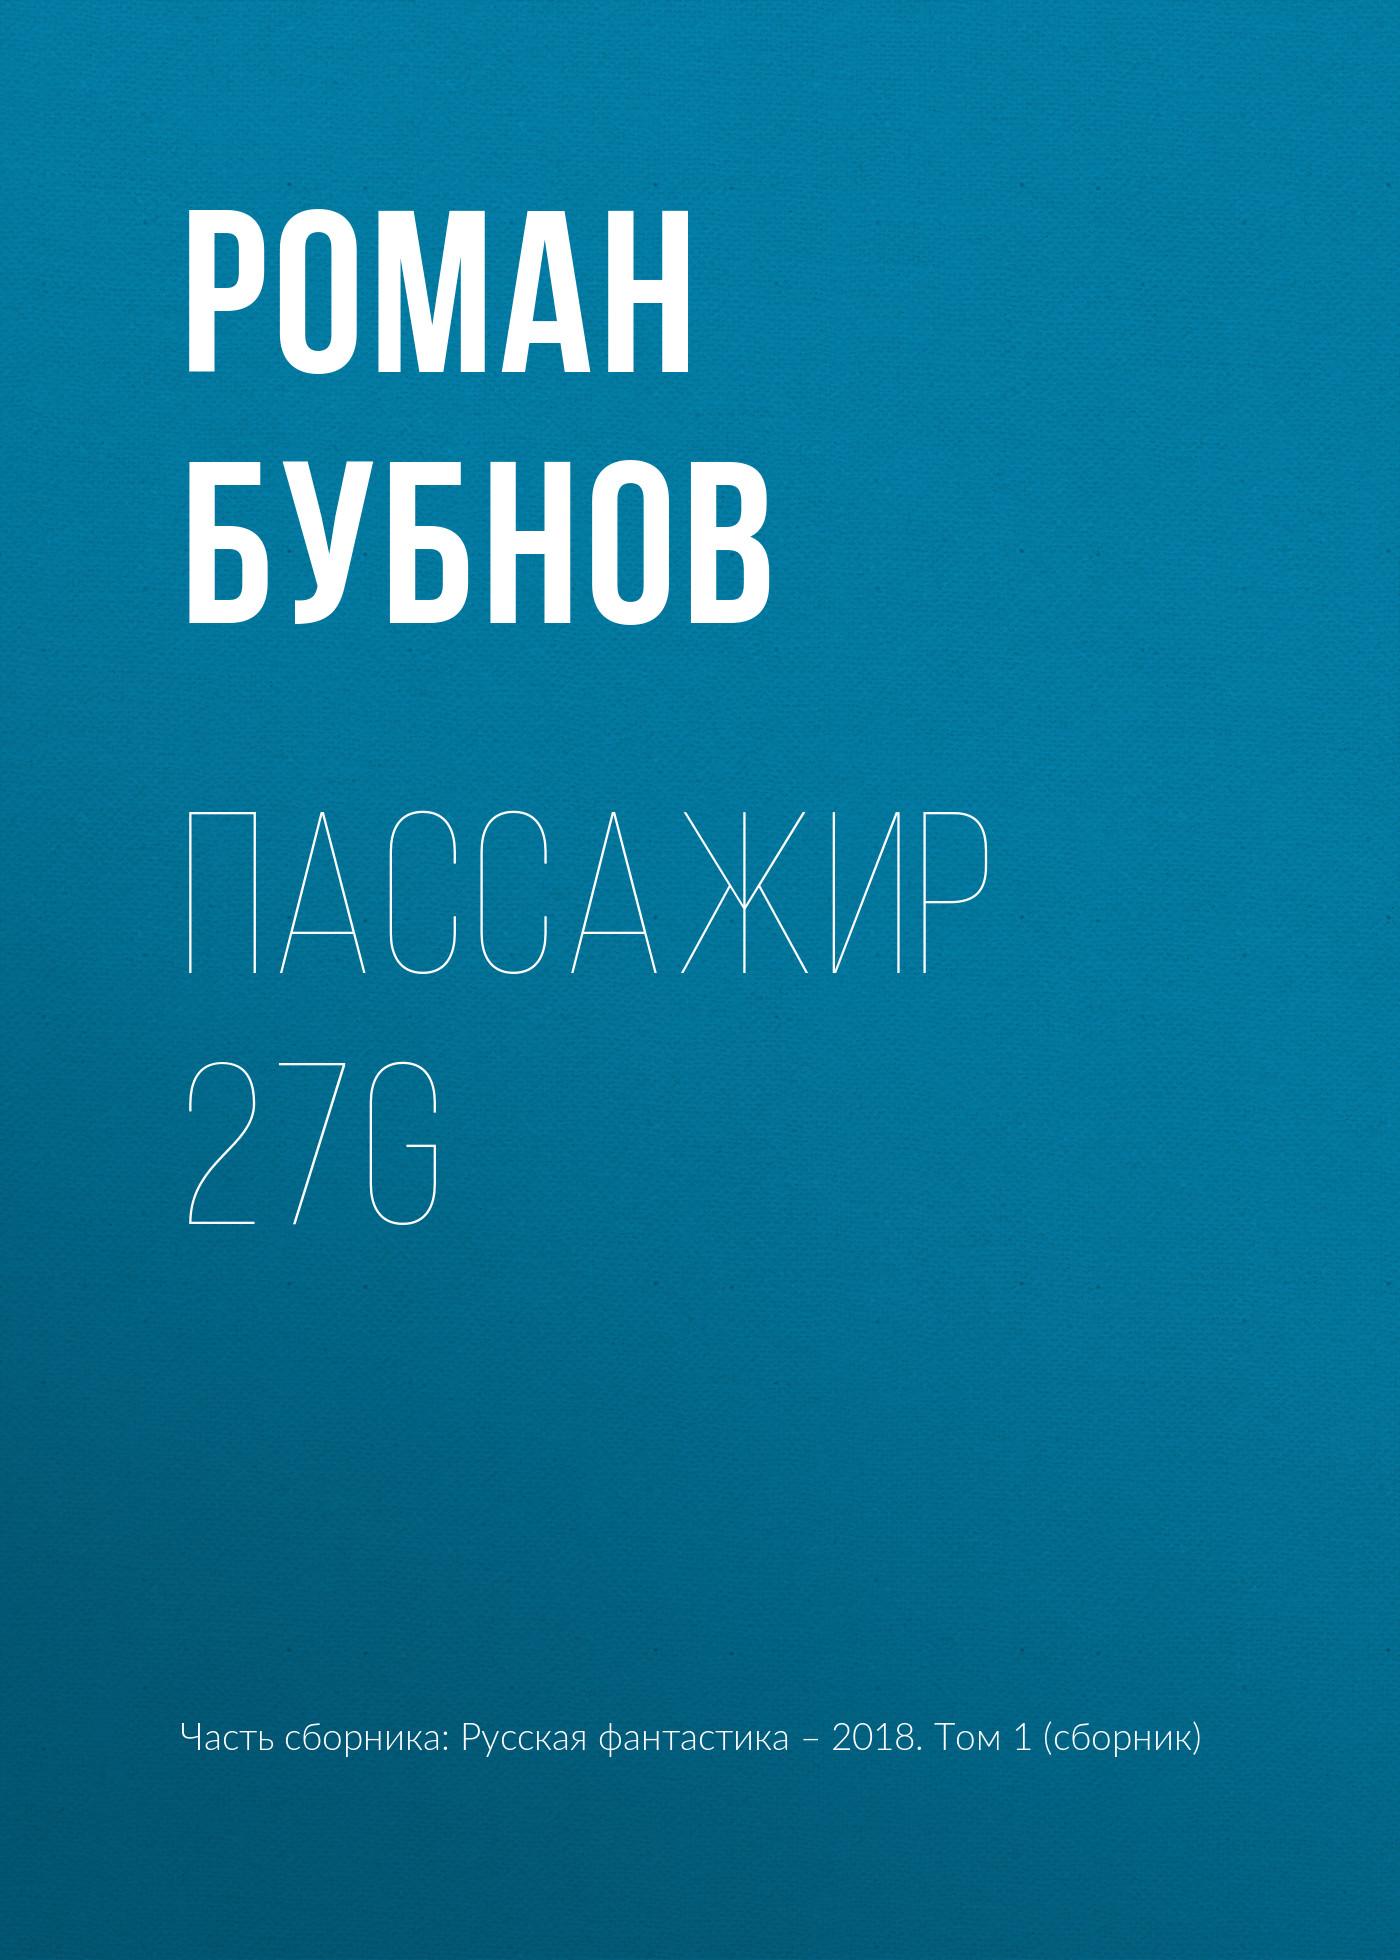 Роман Бубнов Пассажир 27G авиабилеты цены рейсы до бургаса